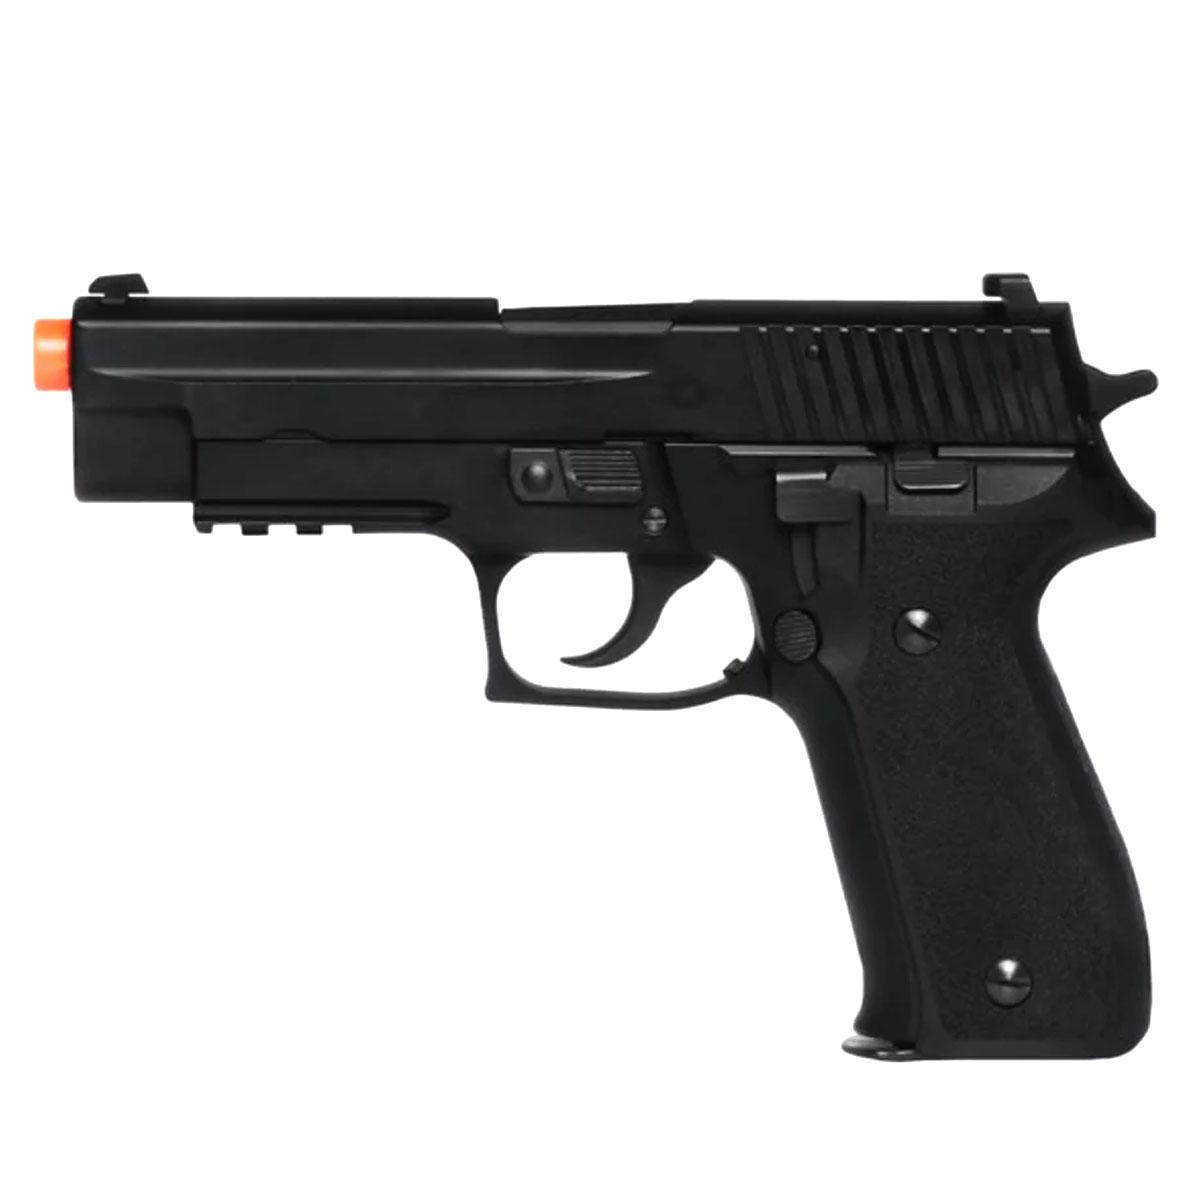 Pistola de Airsoft P226R KSC SIG SAUER Green Gás Blowback